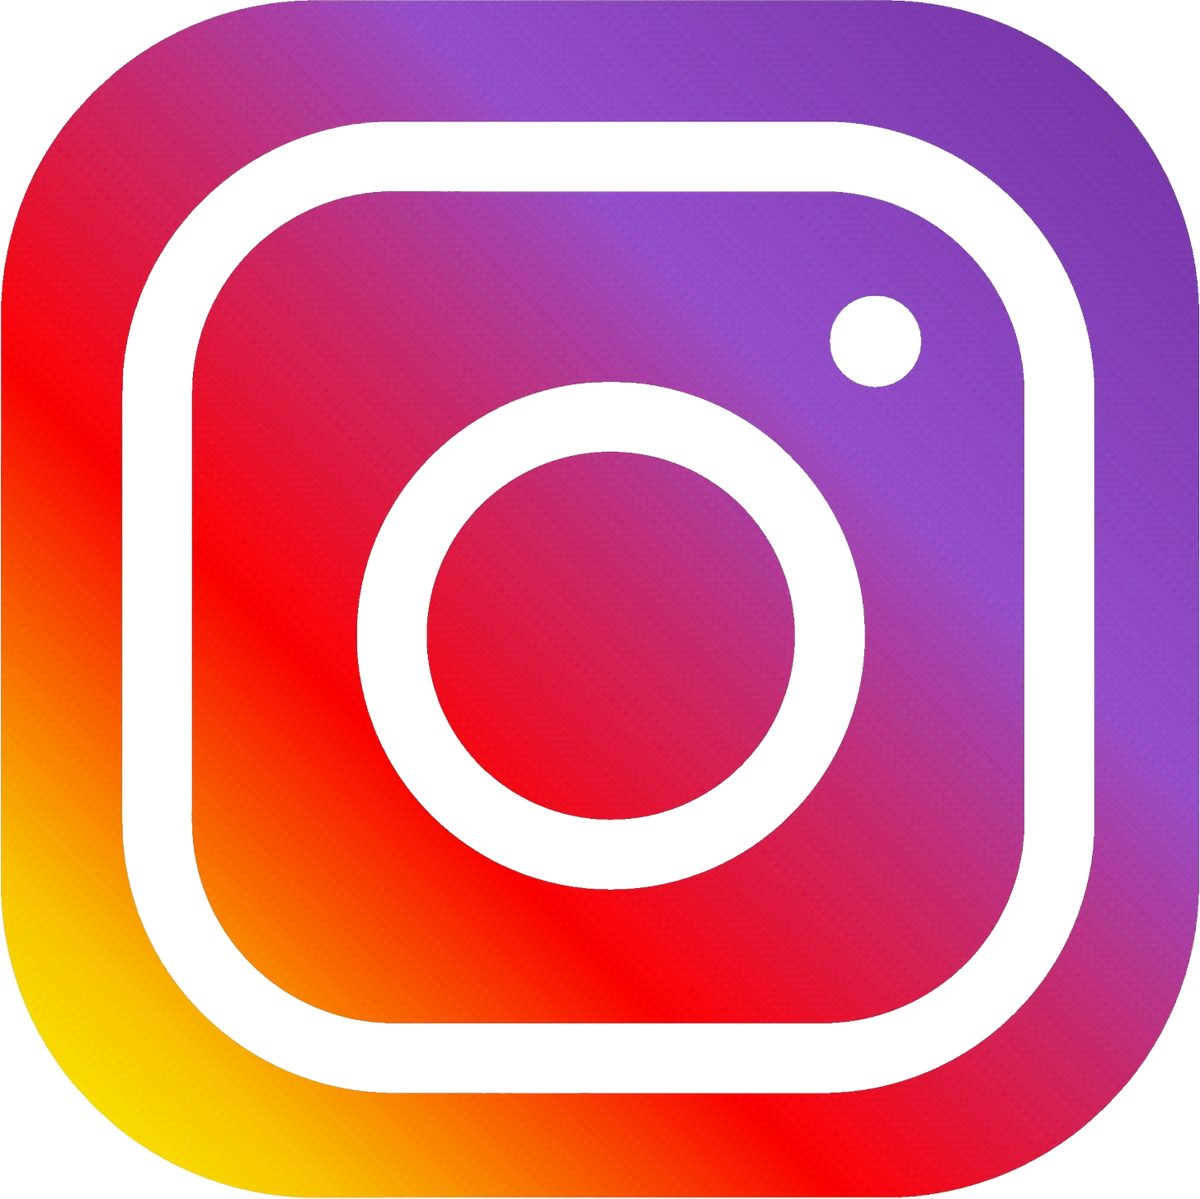 Resultados Da Pesquisa De Imagens Do Google Para Https Upload Wikimedia Org Wikipedia Commons Thumb 5 Instagram Logo New Instagram Logo Vintage Handkerchiefs